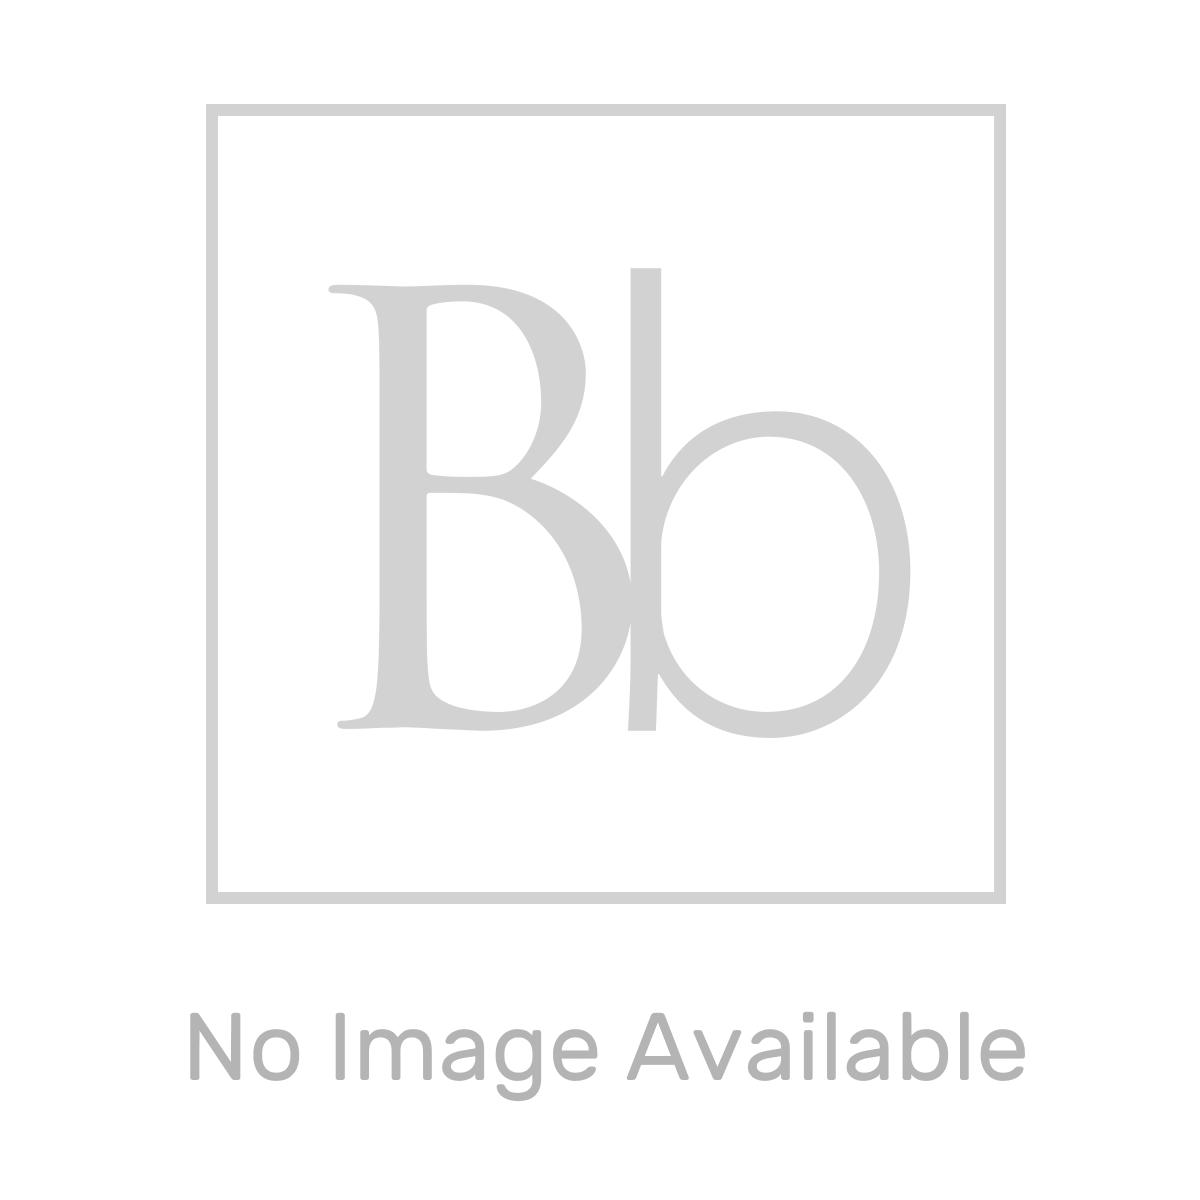 RAK Washington Grey Vanity Unit with Grey Countertop 1200mm Measurements